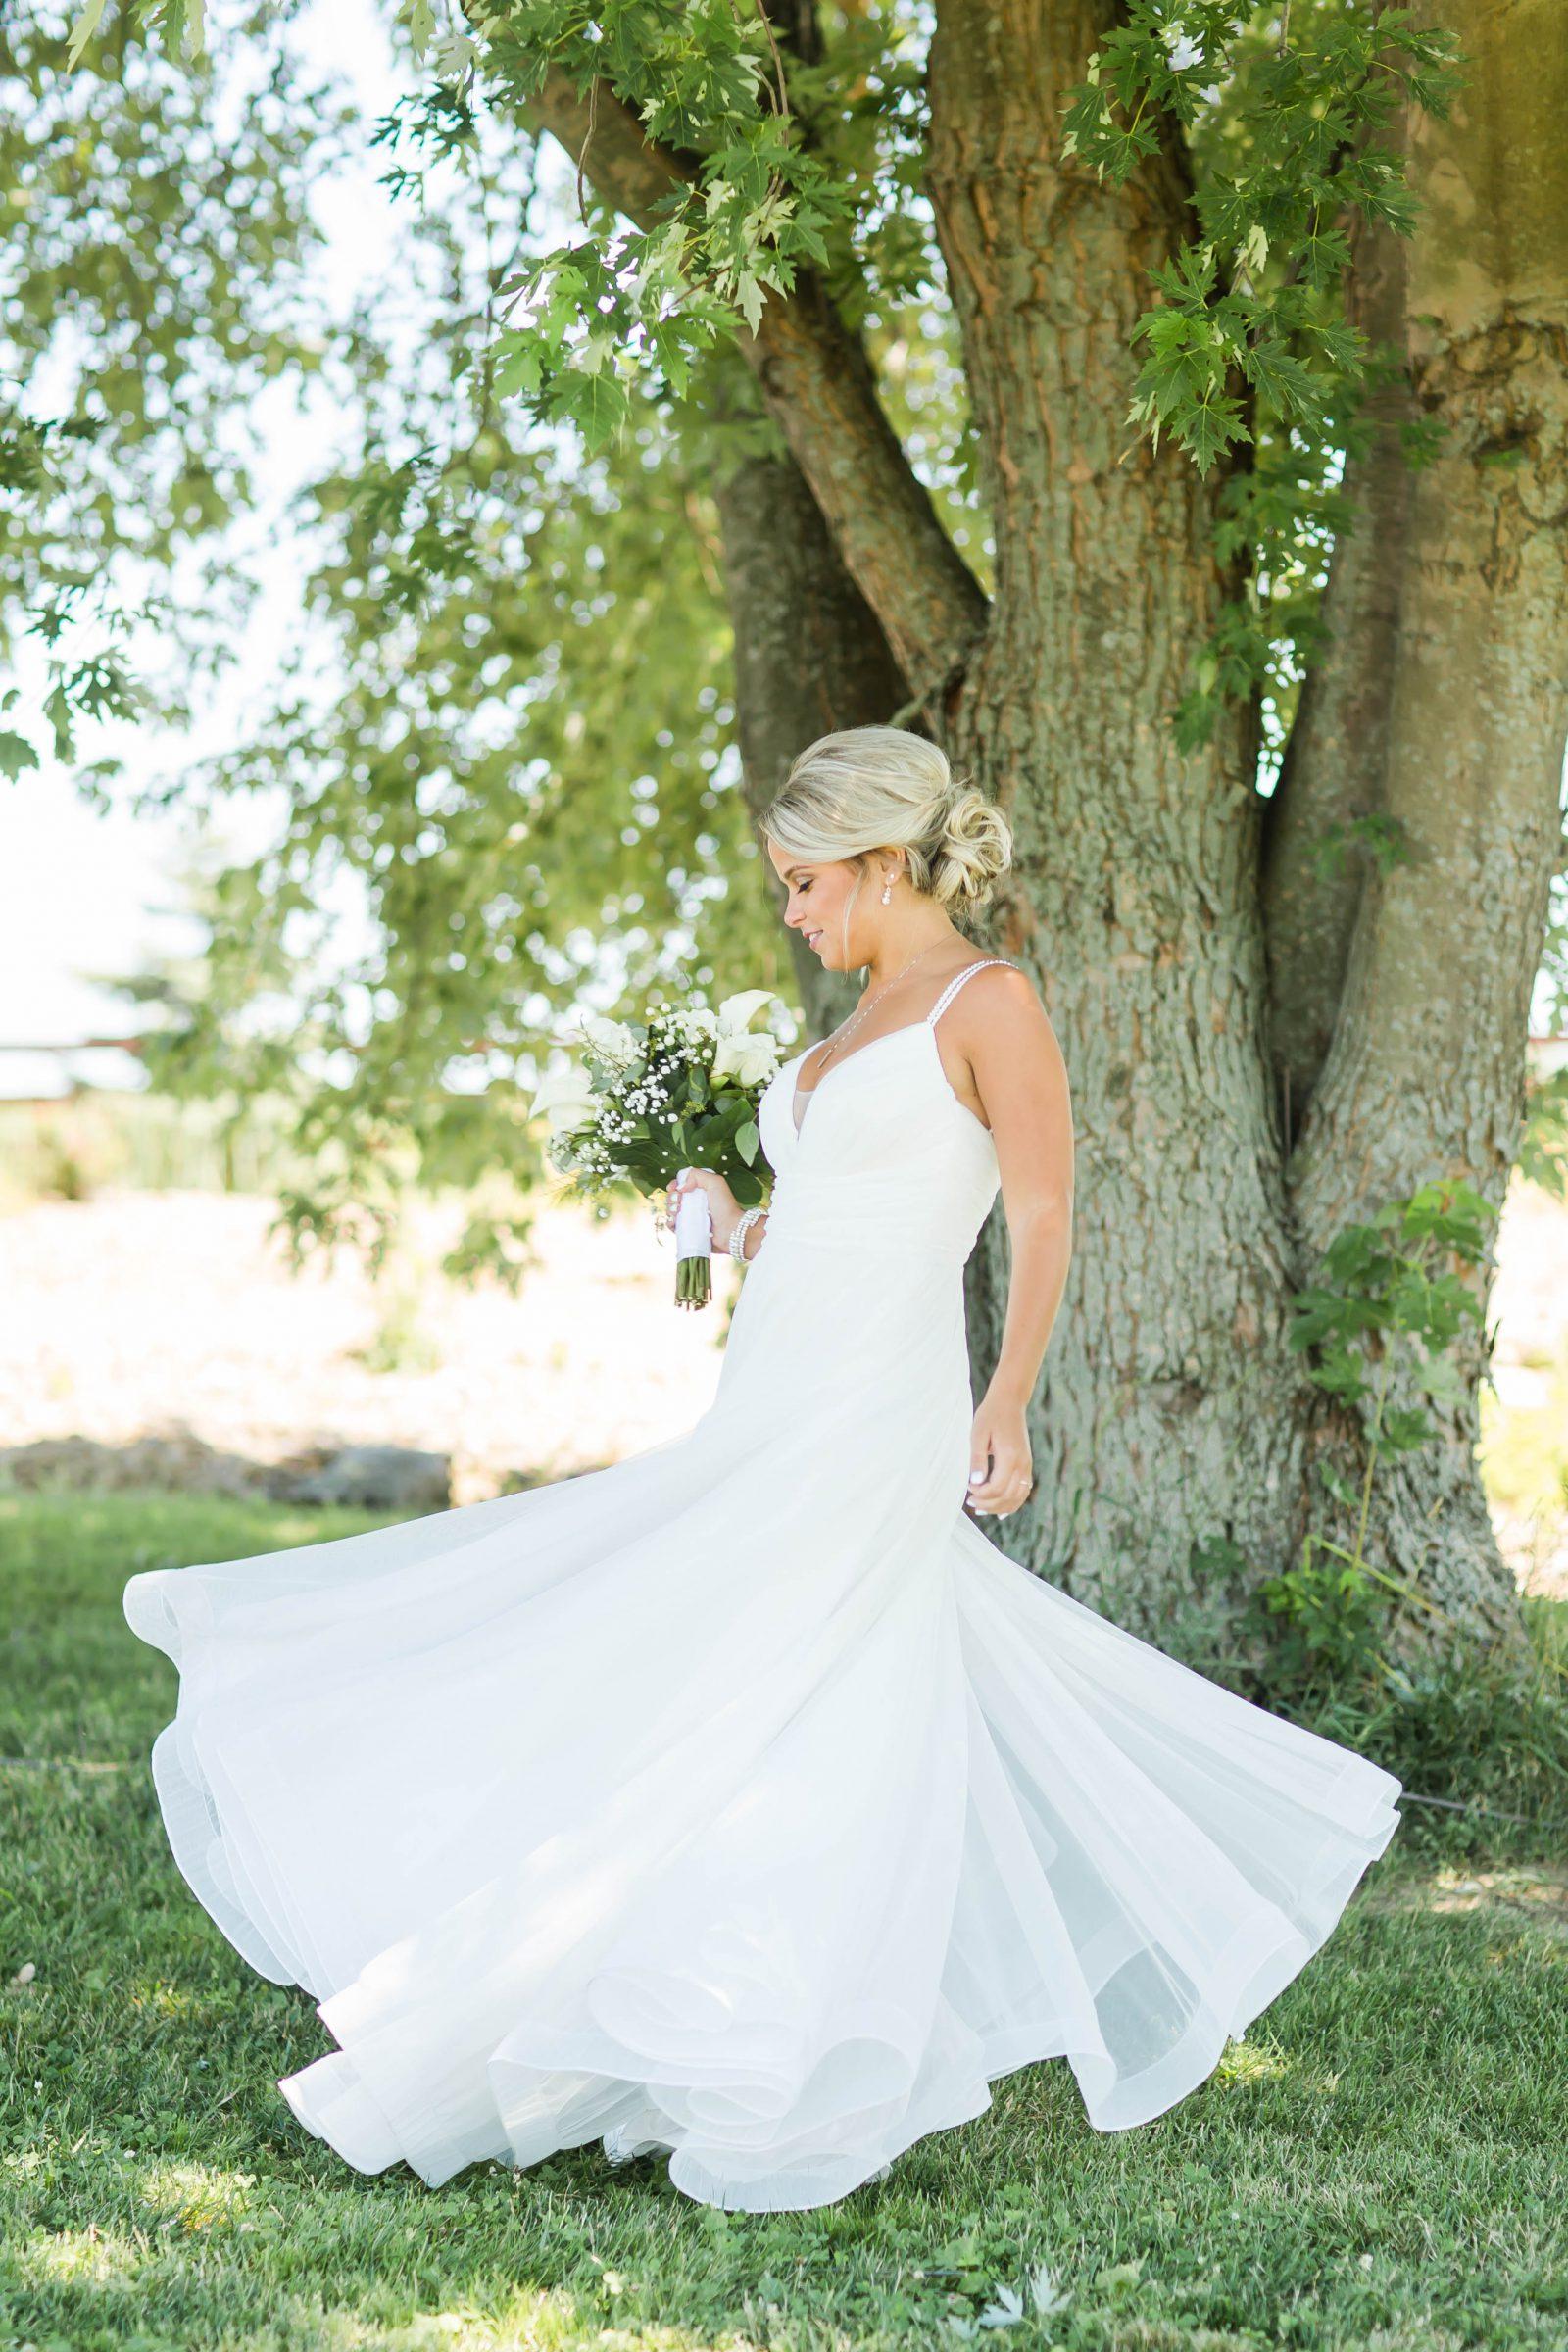 peacock-ridge-summer-wedding-photographer-akron-ohio-loren-jackson-photography-29